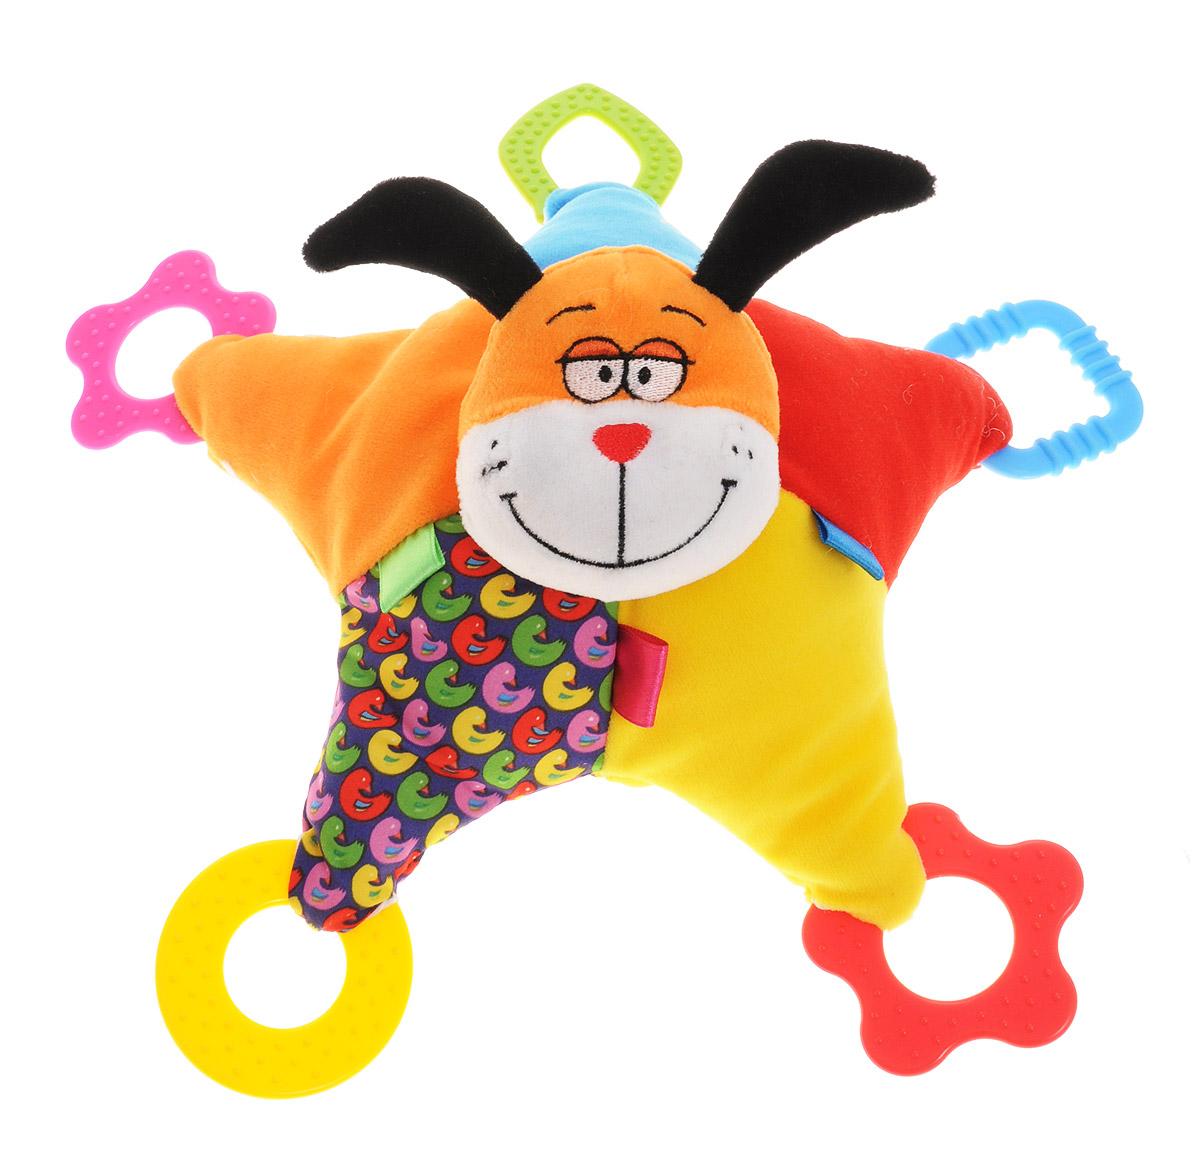 Bondibon Мягкая игрушка-погремушка Собака 32 см, Bondibon Creatures Co., LTD